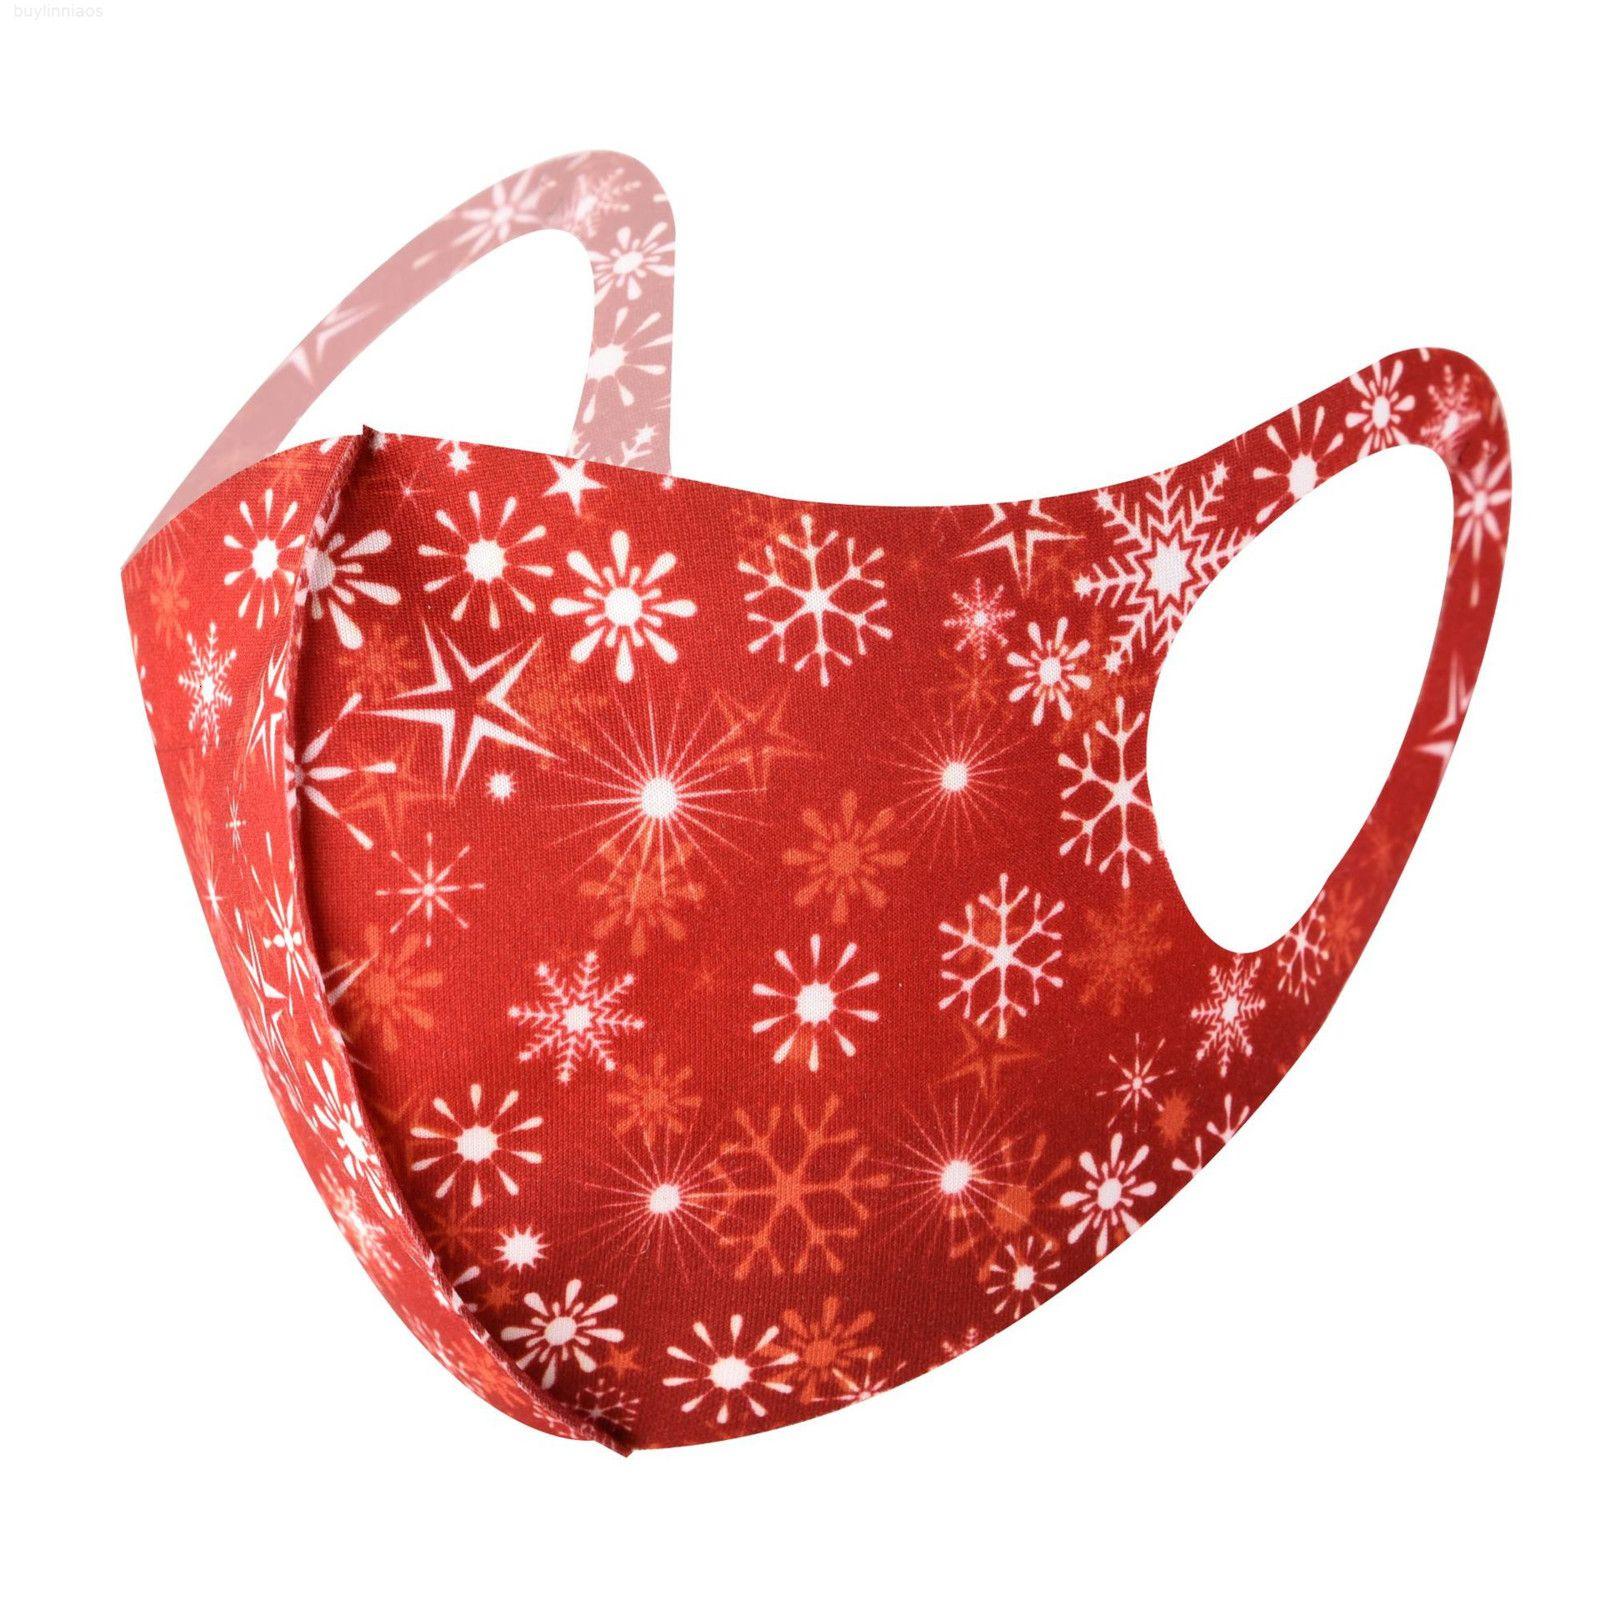 Chapéu santa christmas impresso festa claus máscaras de doces moda gelado máscaras de seda crianças máscara rosto reutilizável